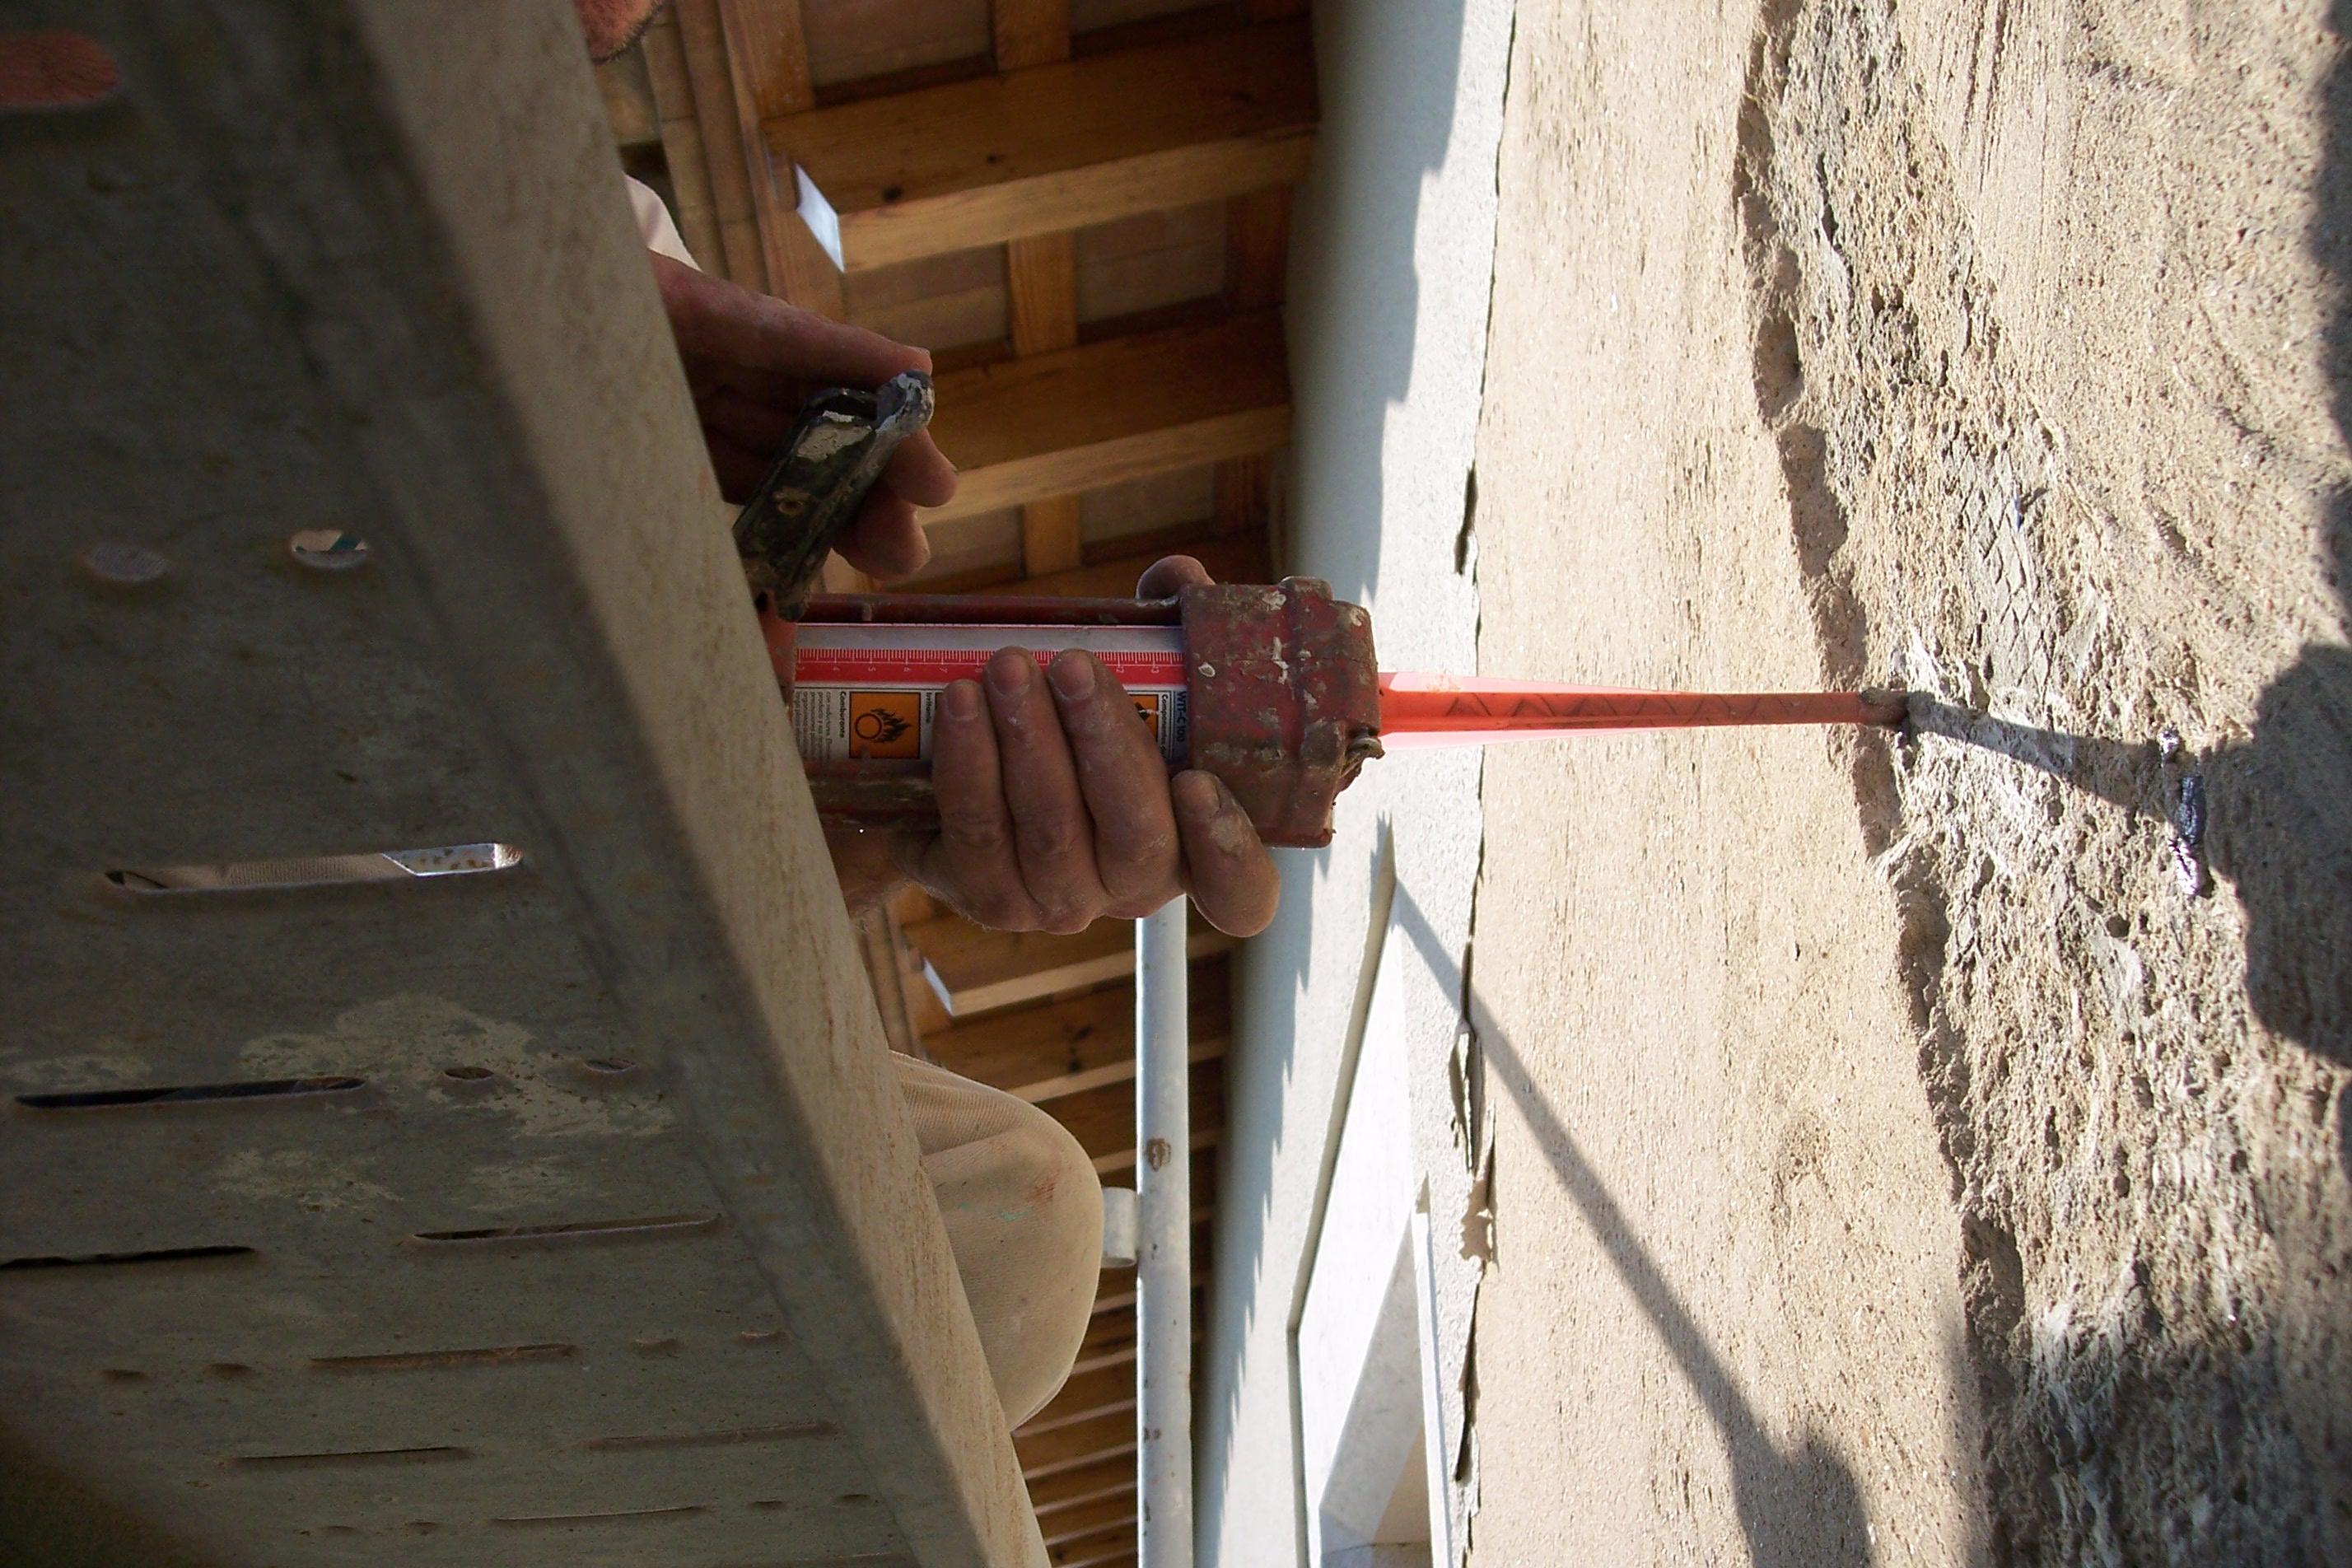 masilla bicomponente  para posterior colocacion de grapas metalicas para fachadas